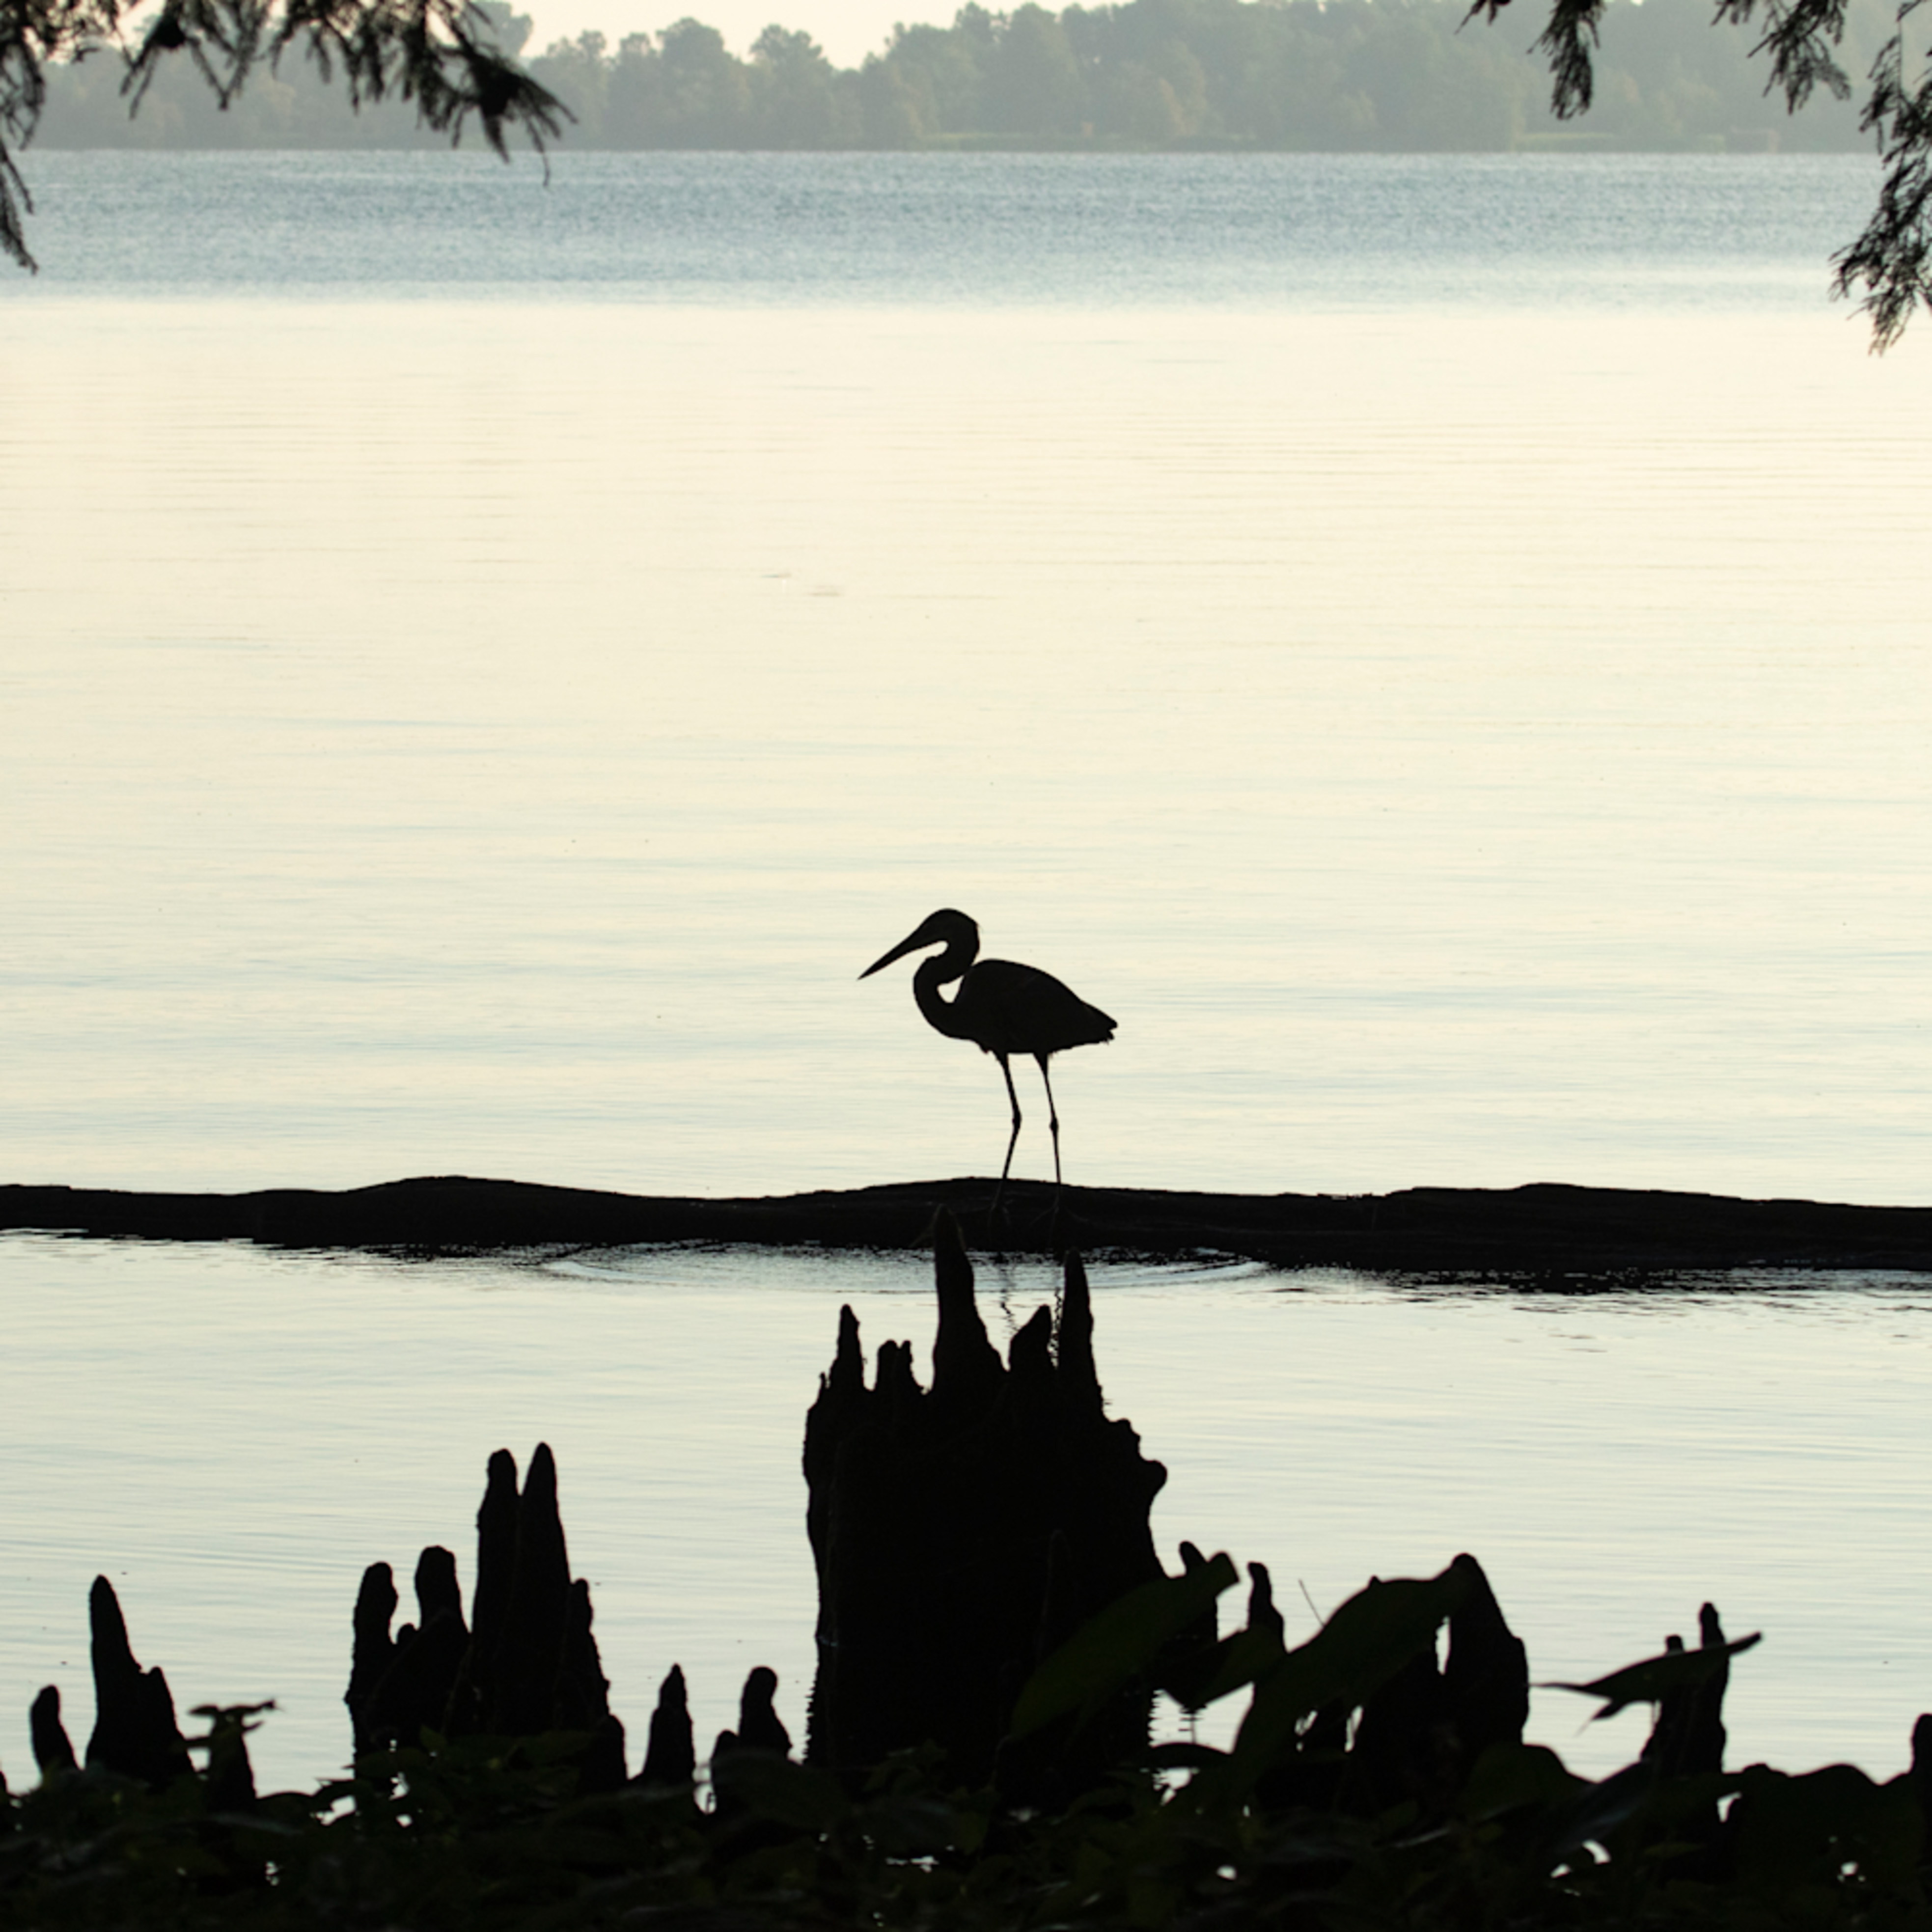 Heron silhouettes mg 7514 srm20 uvoe0f